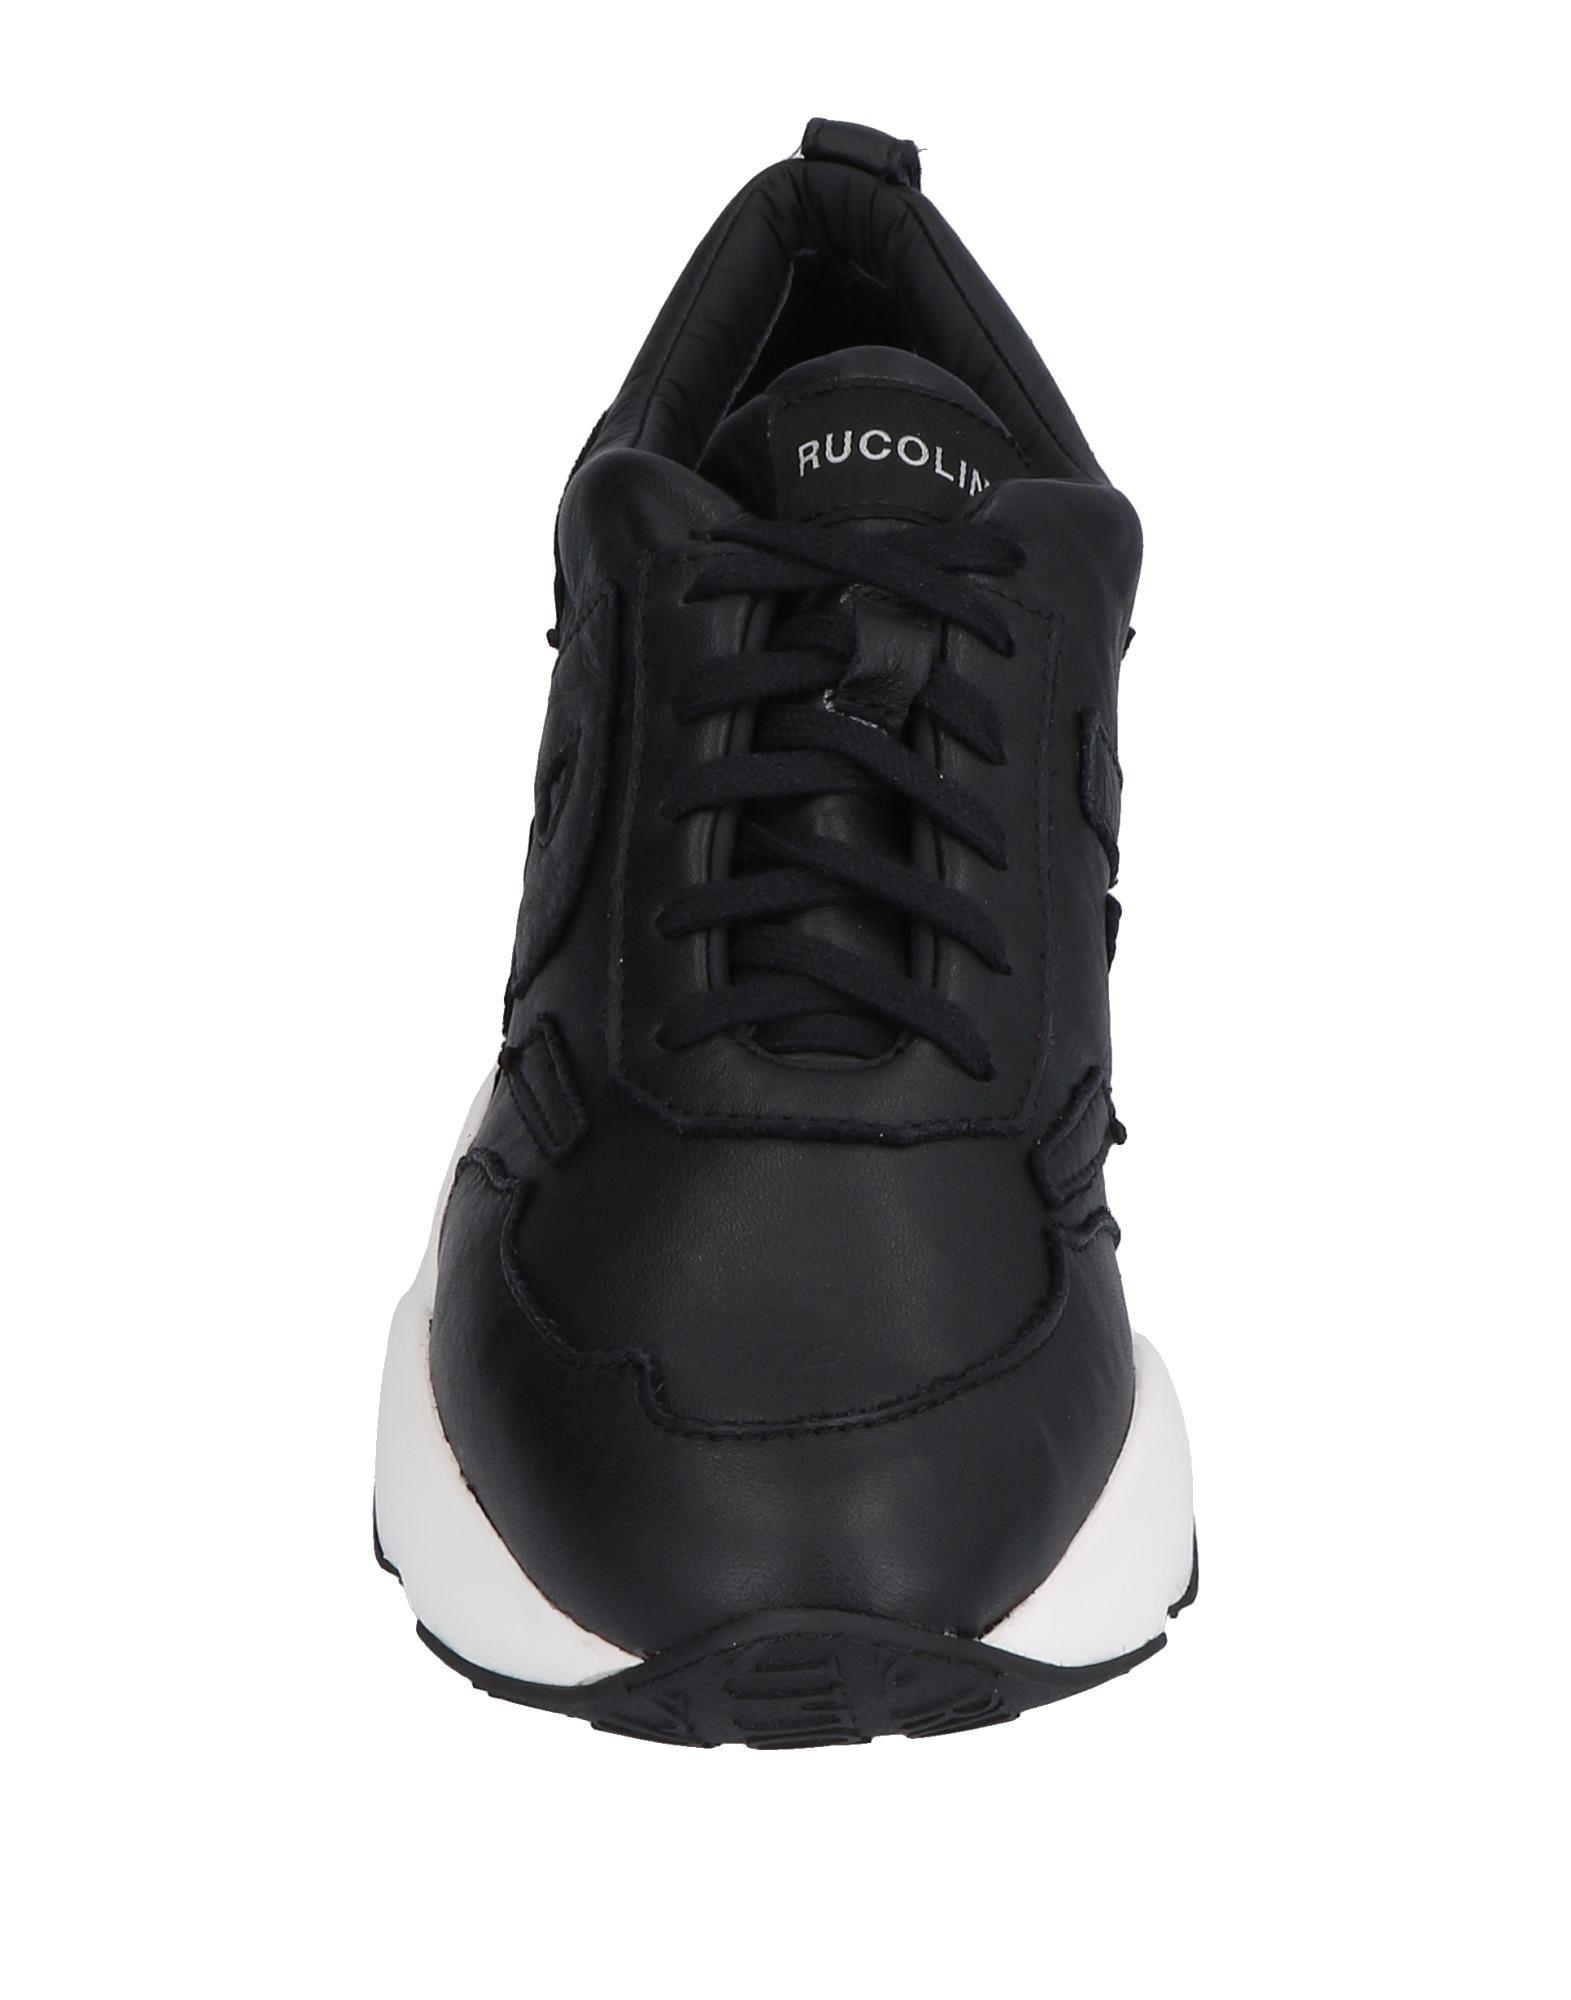 Stilvolle billige Schuhe Ruco  Line Sneakers Damen  Ruco 11496090IX 56ad8c